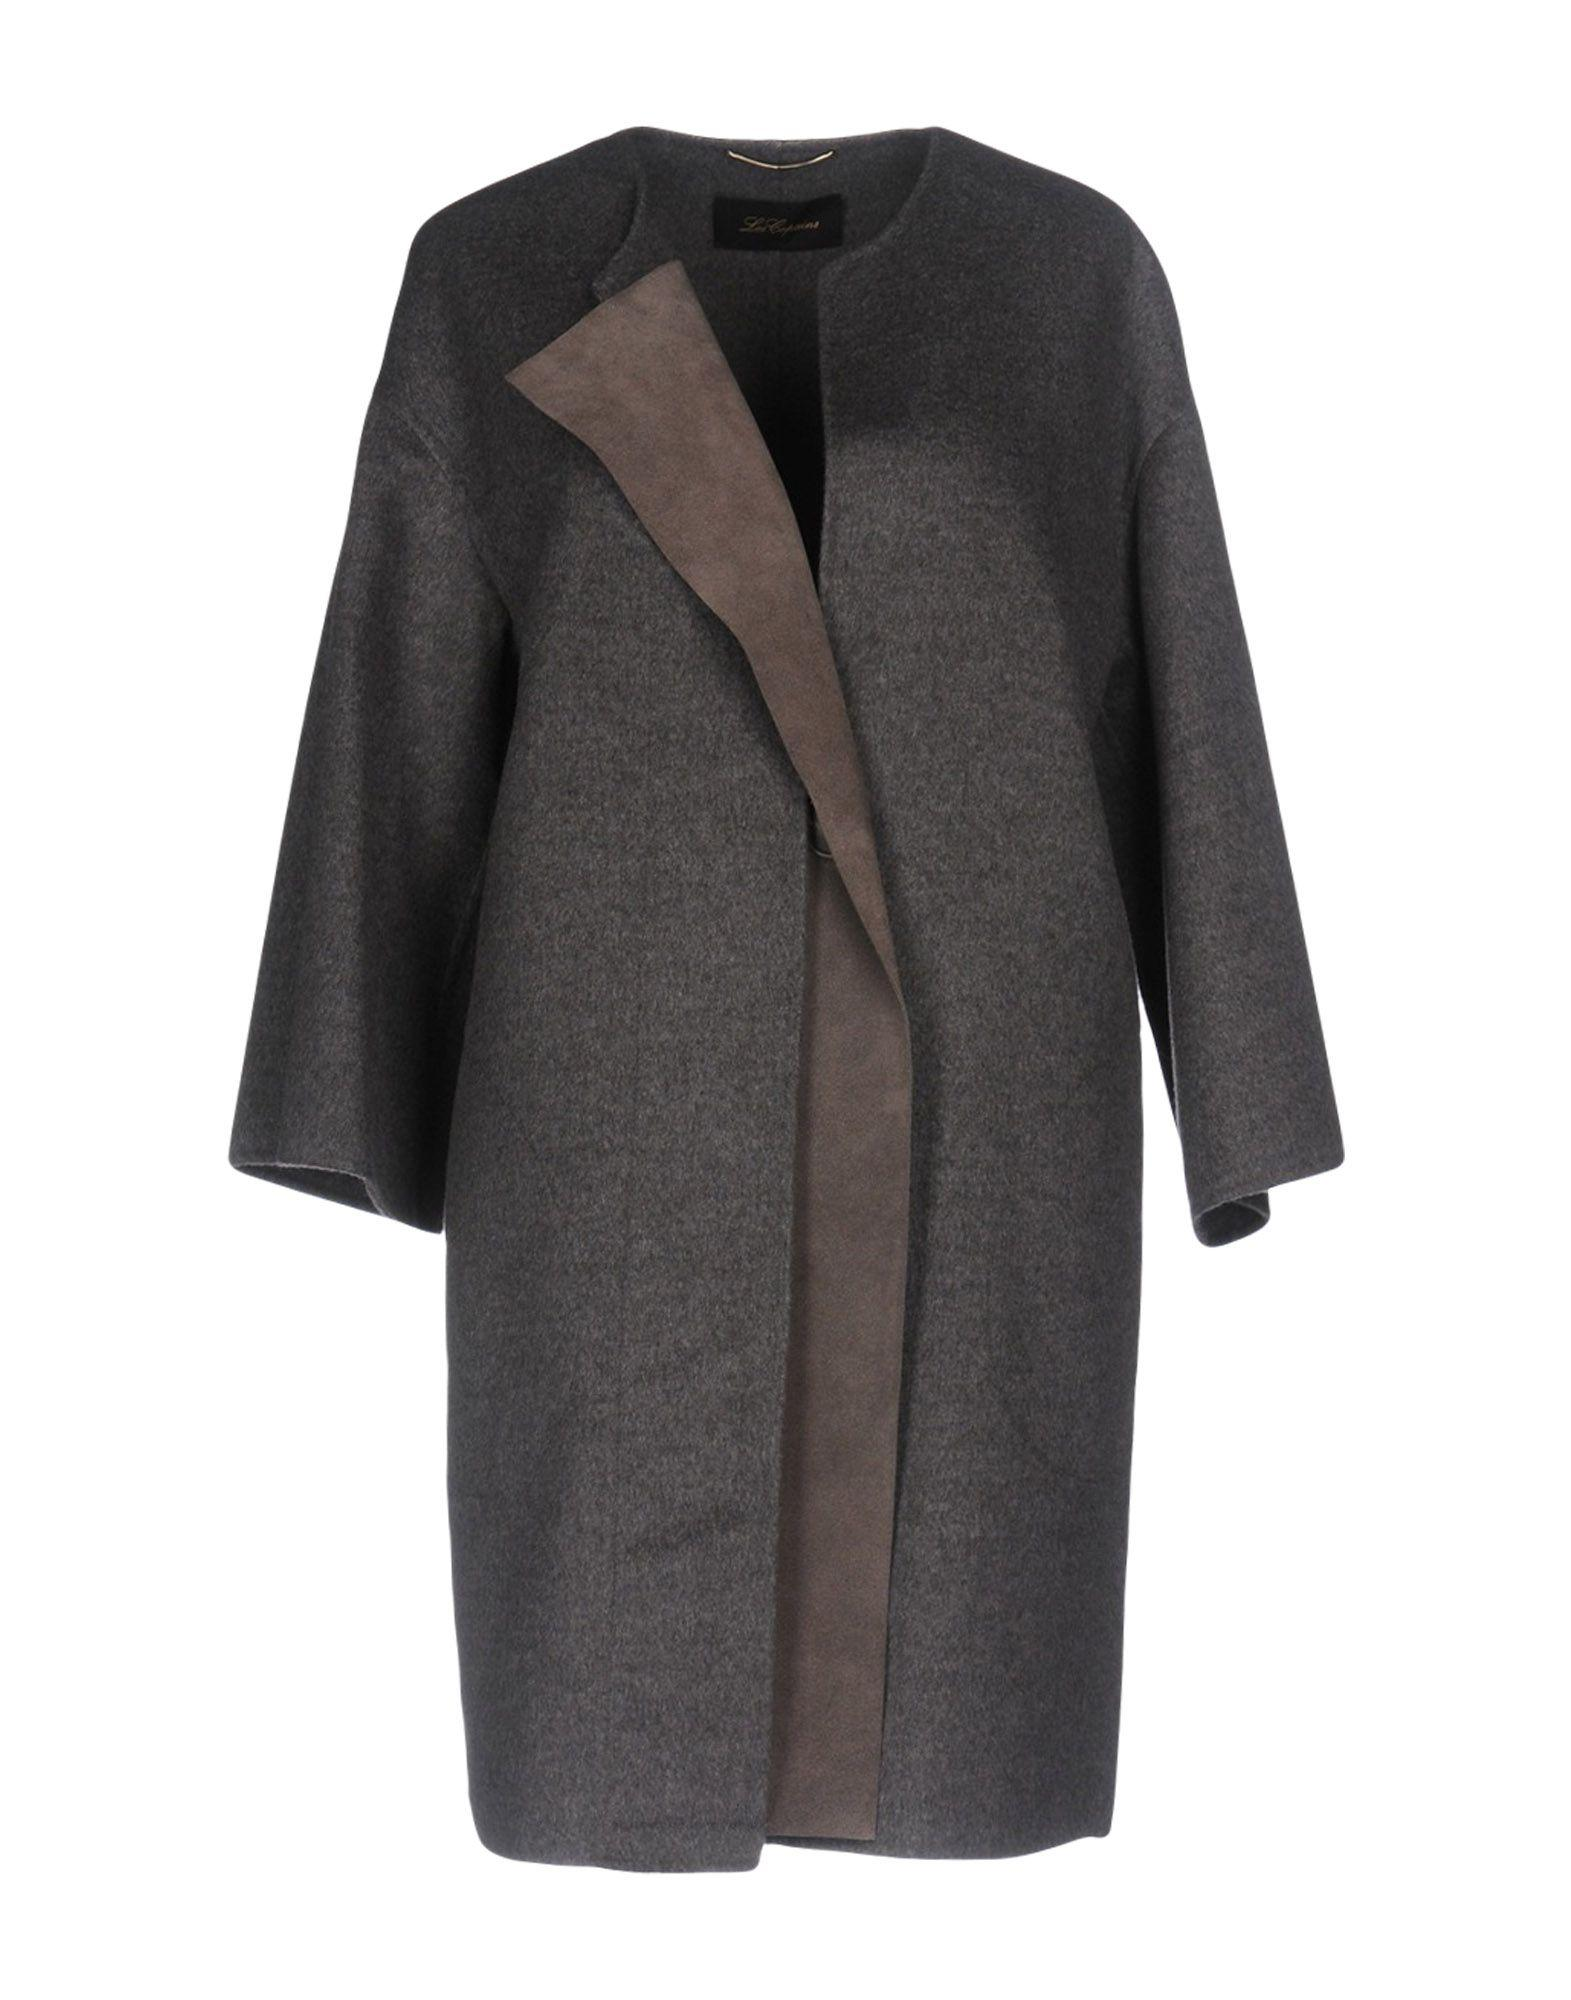 Les Copains Coat In Grey